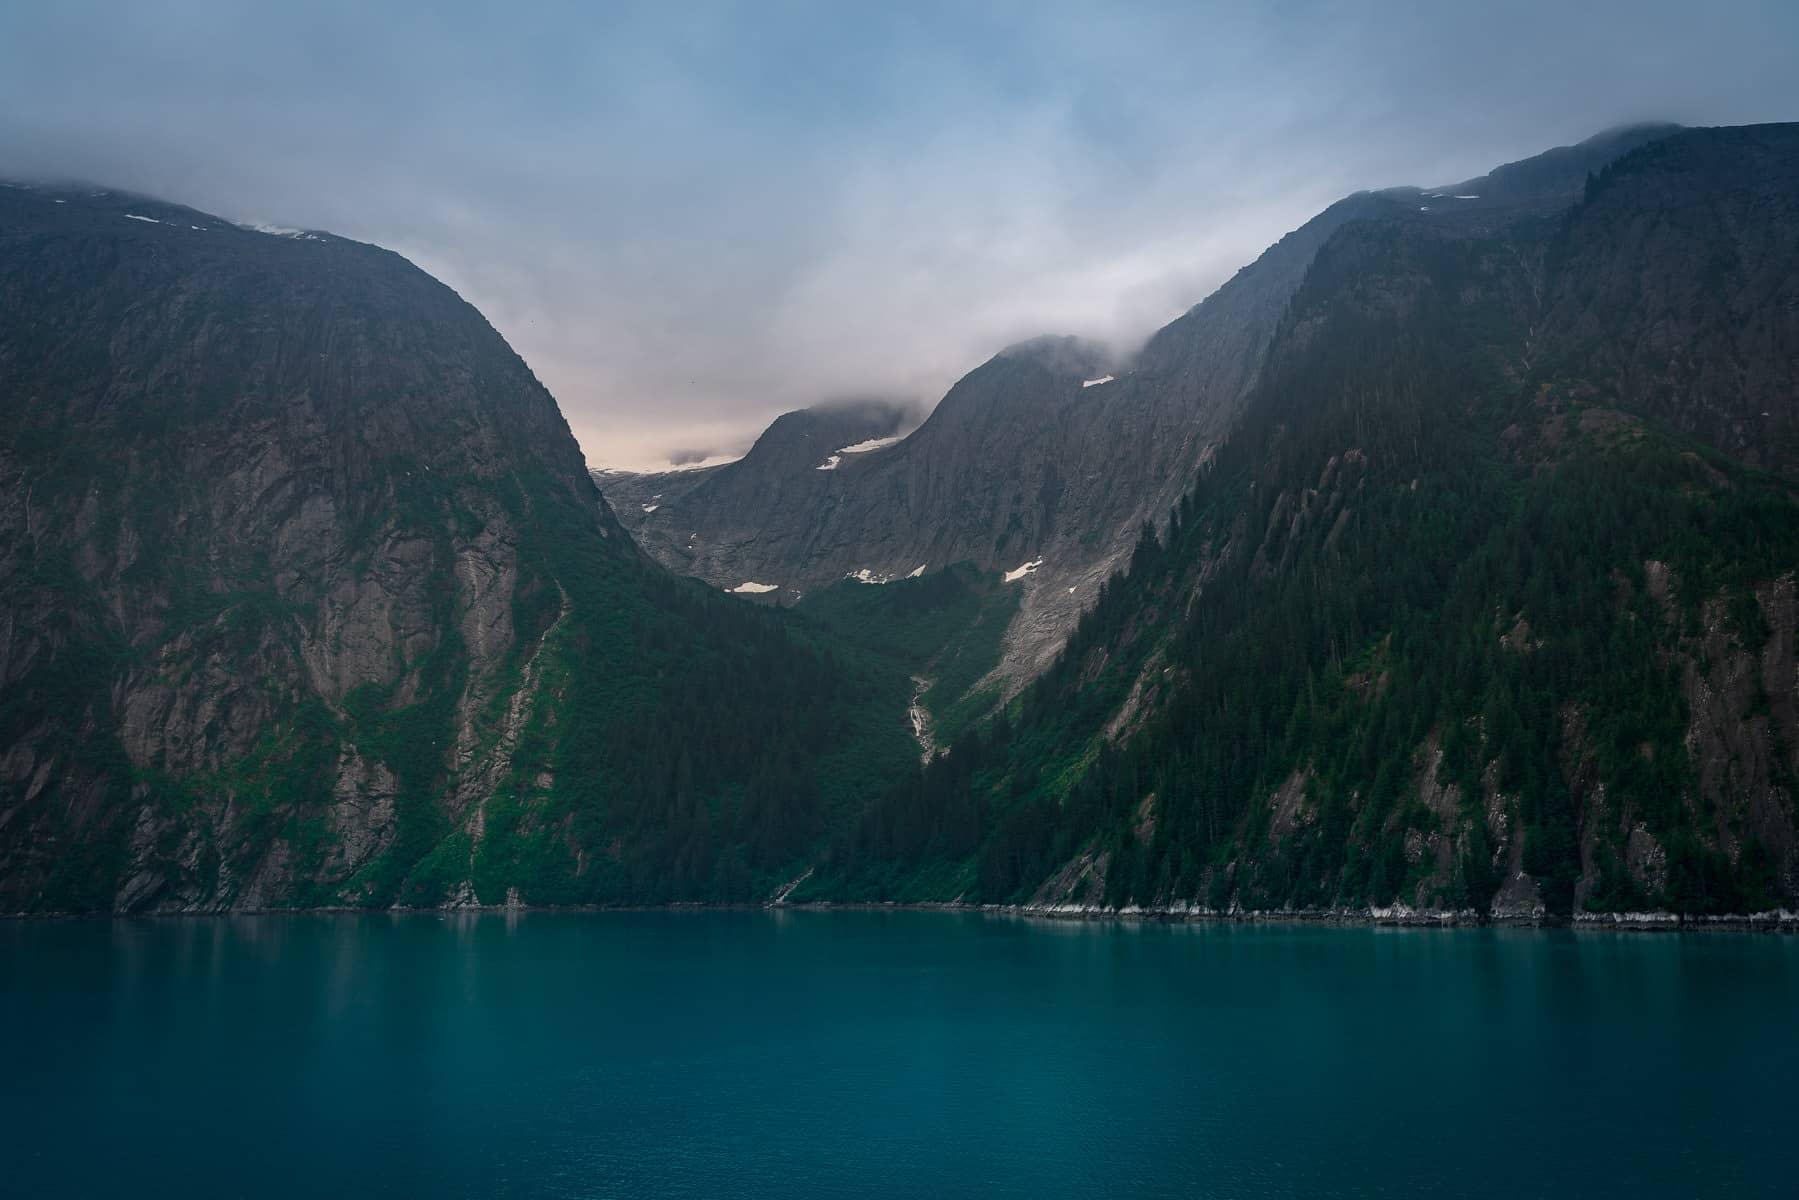 The steep mountainous terrain of the Alaska's Tracy Arm Fjord.